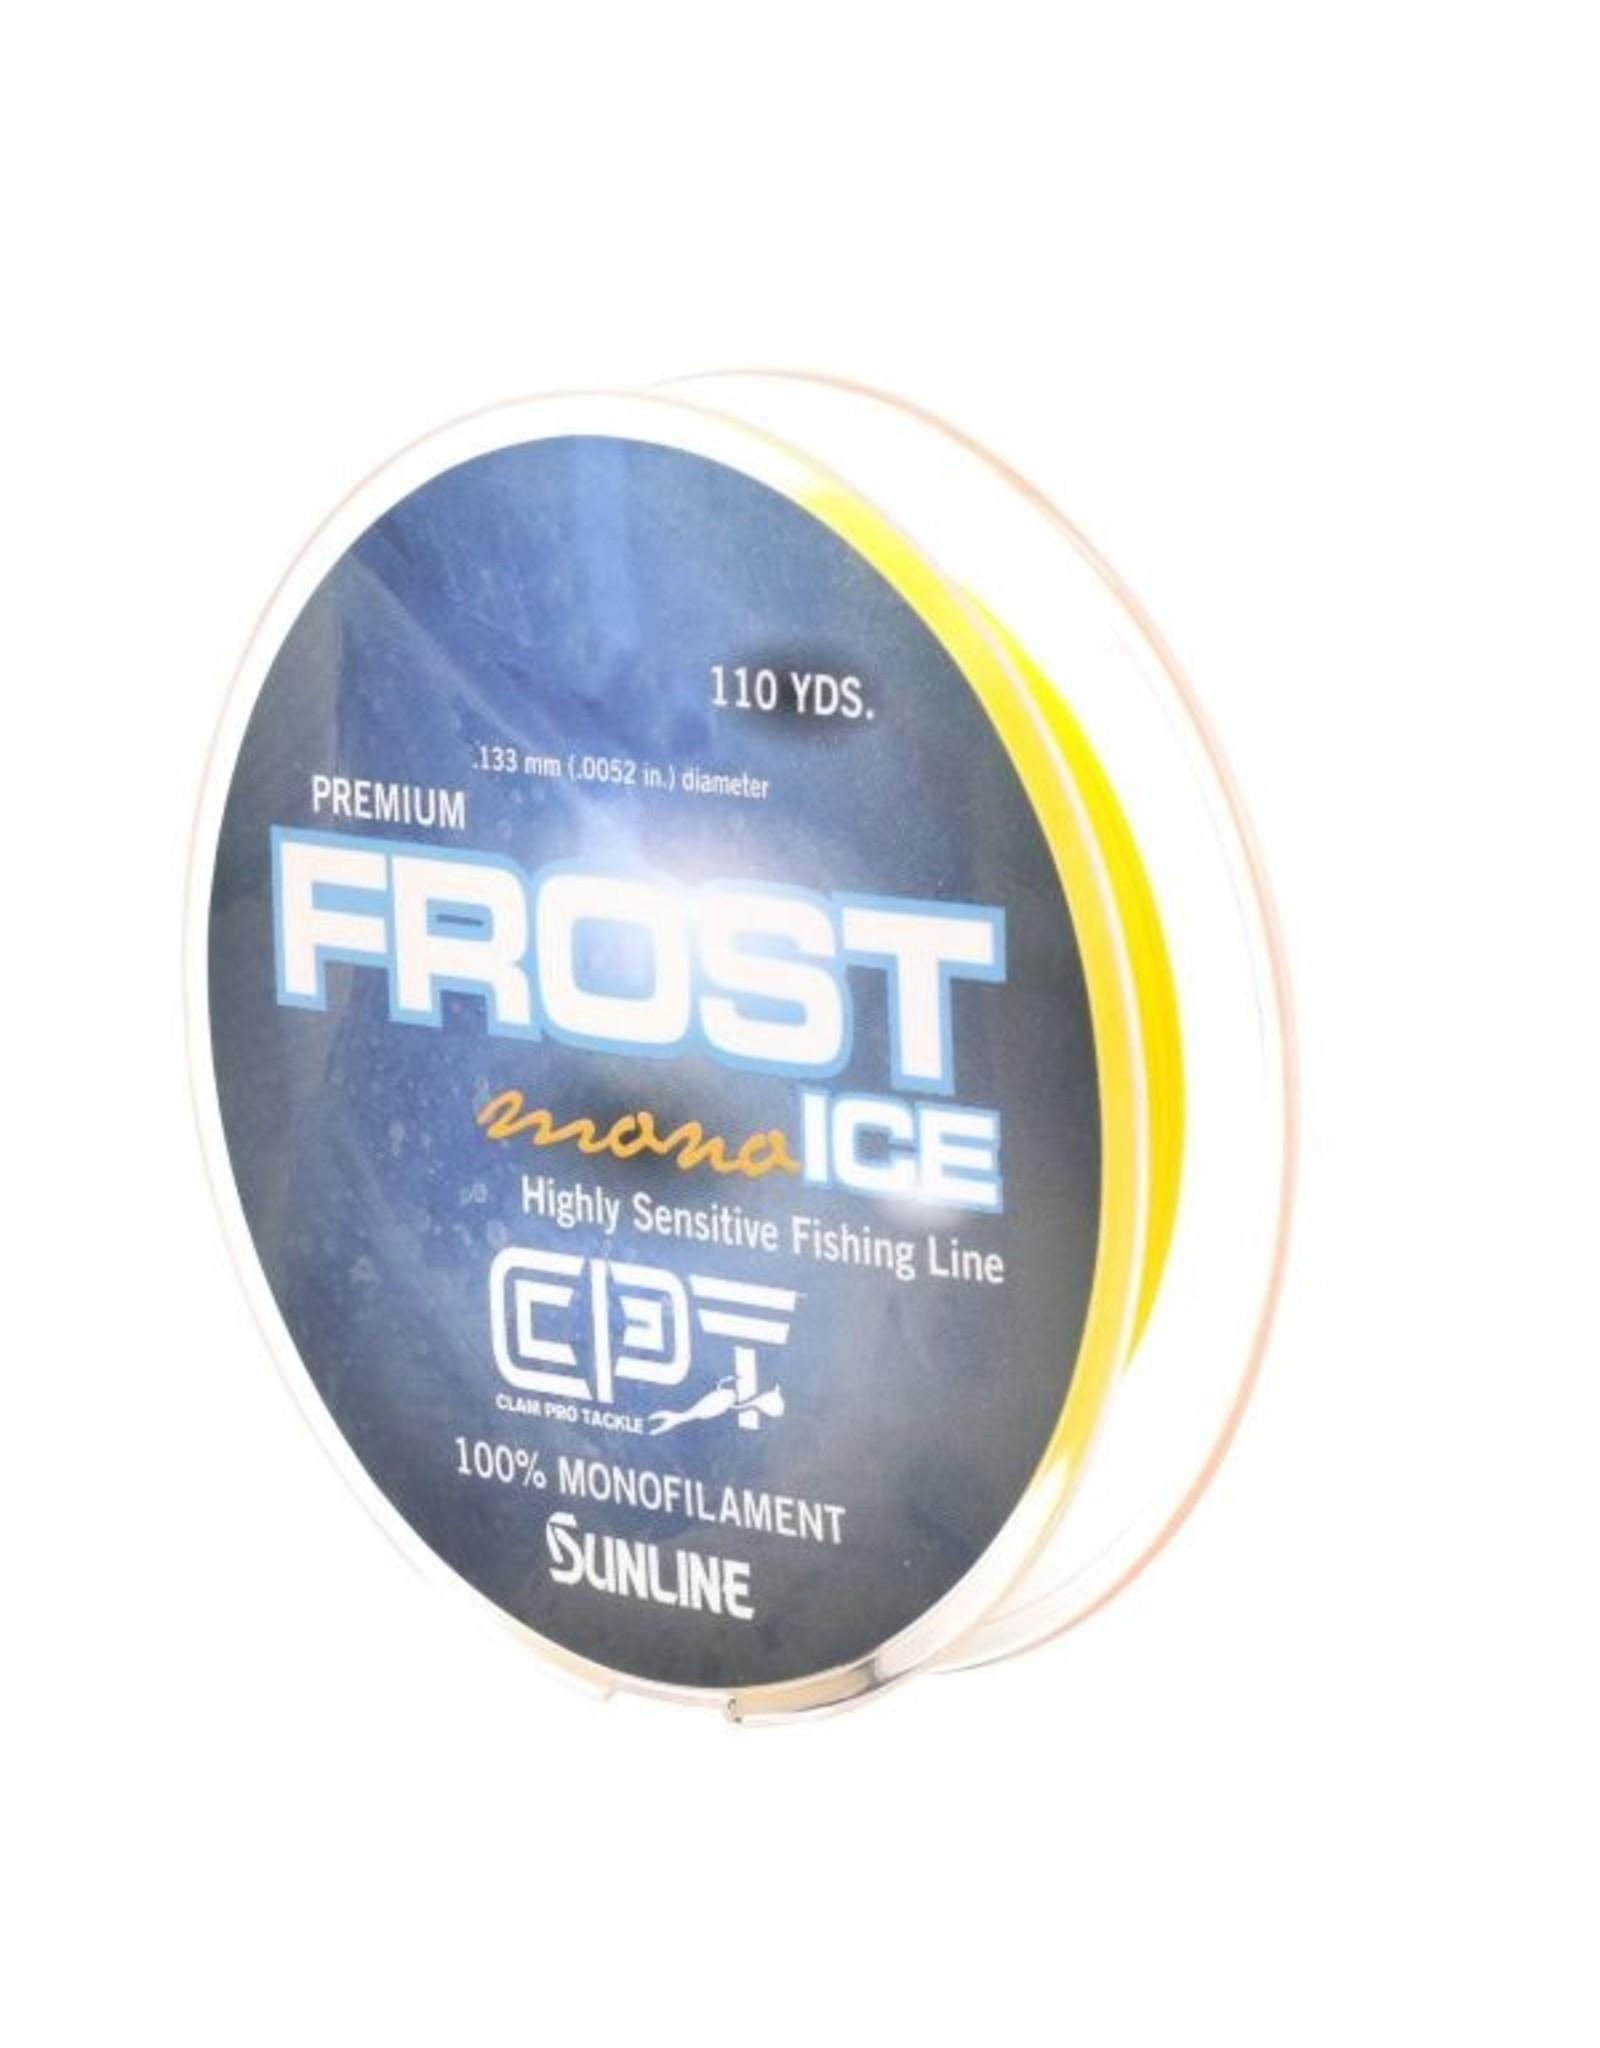 Clam Clam Premium Frost Ice Monofilament fishing line